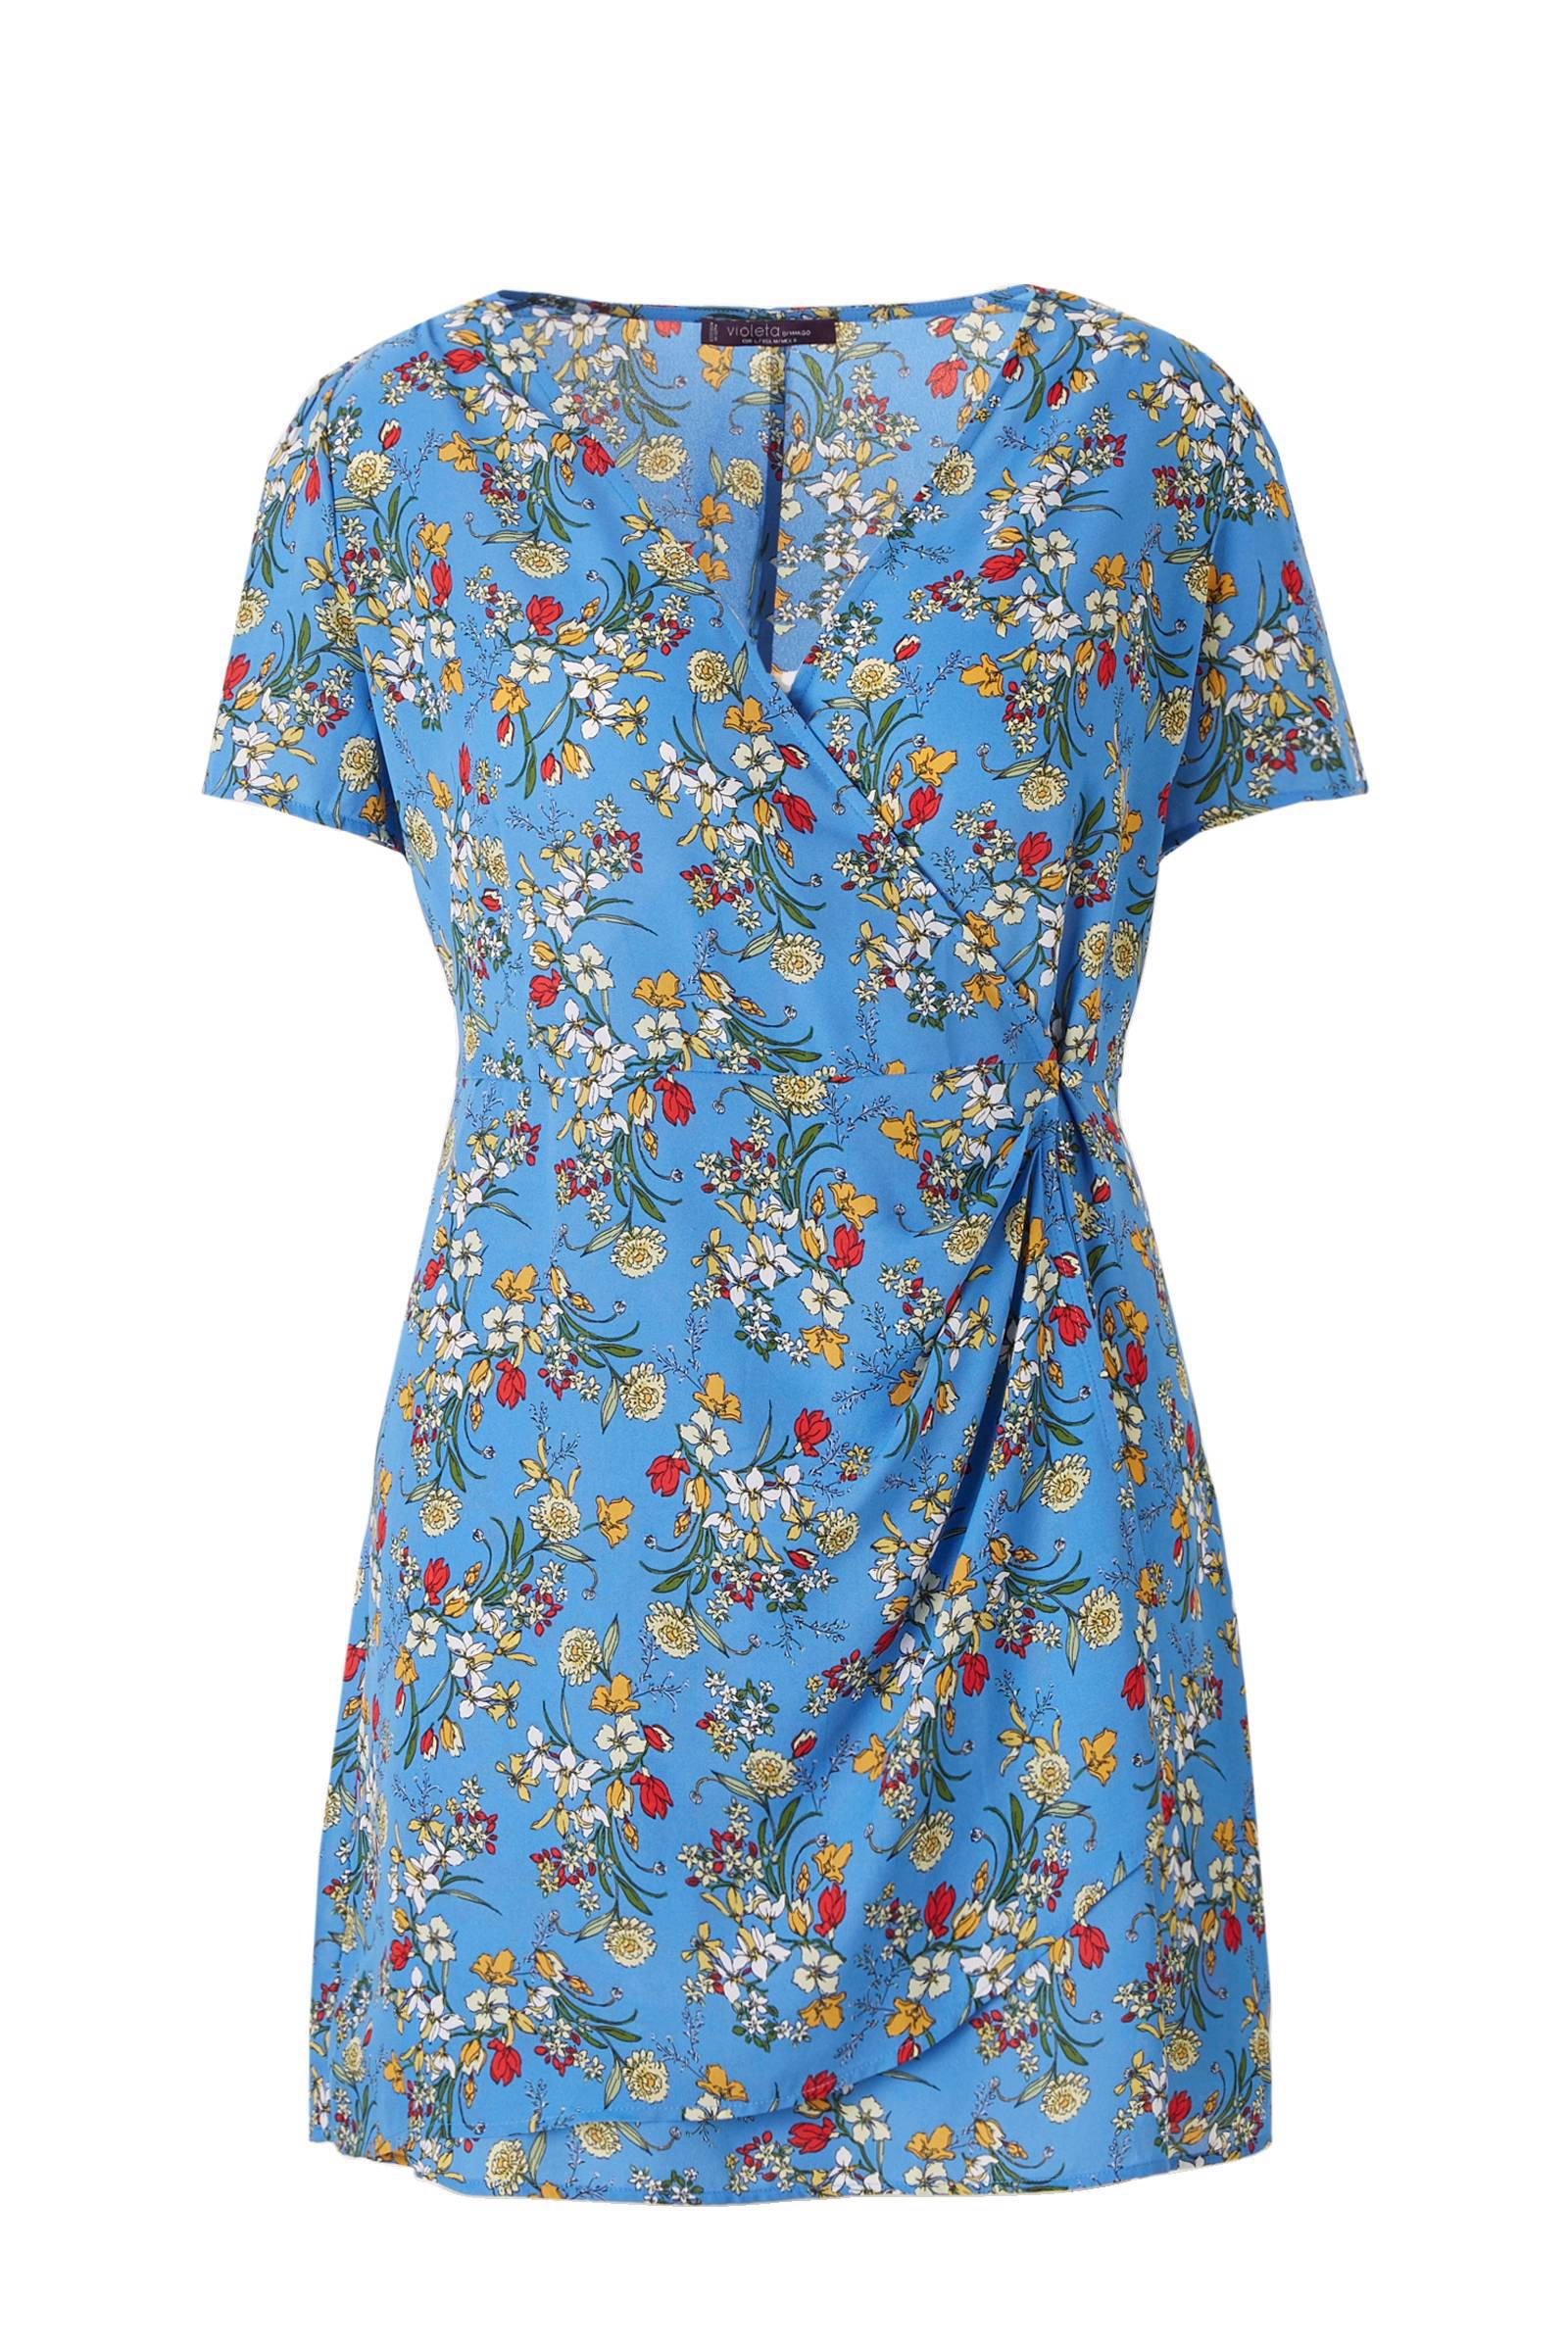 Violeta by Mango jurk met bloemen blauw   wehkamp